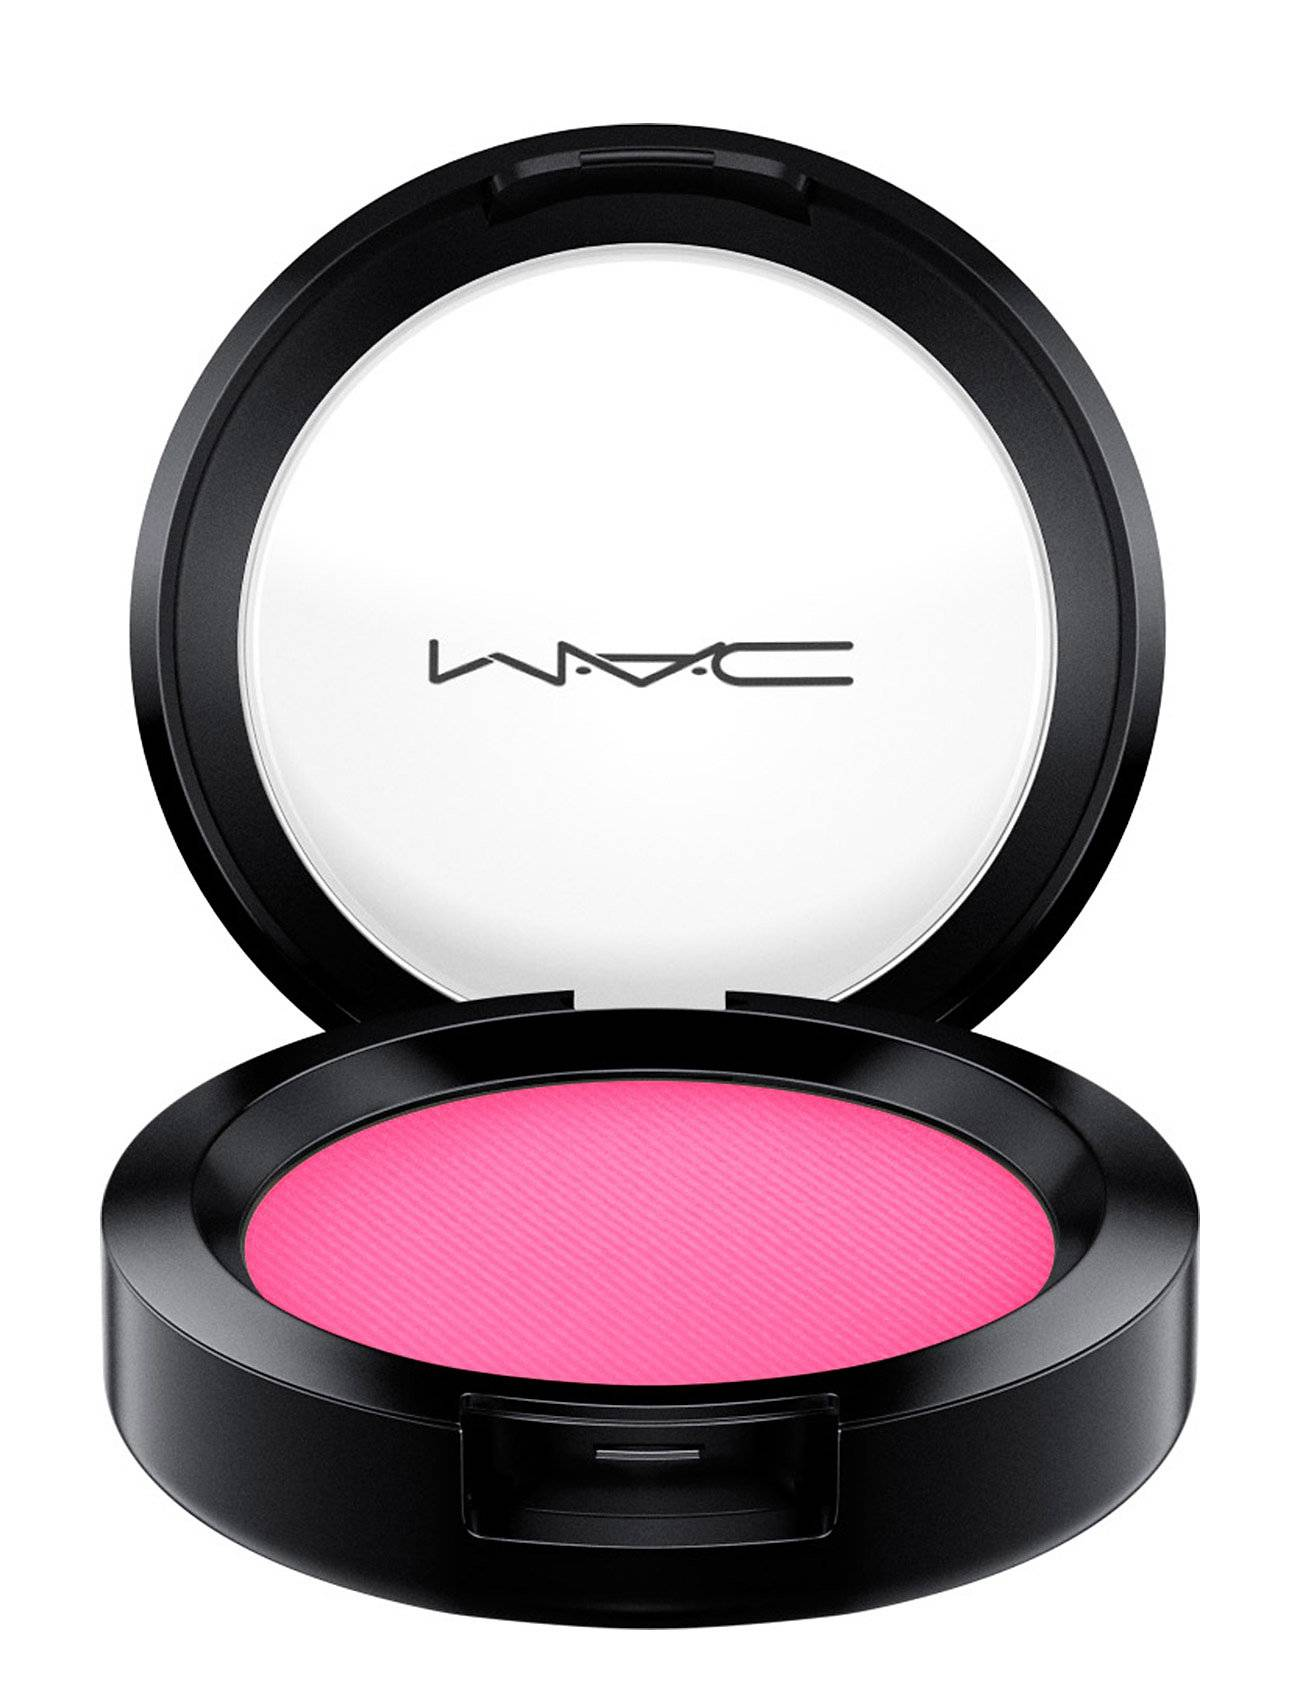 M.A.C. Matte Bright Pink